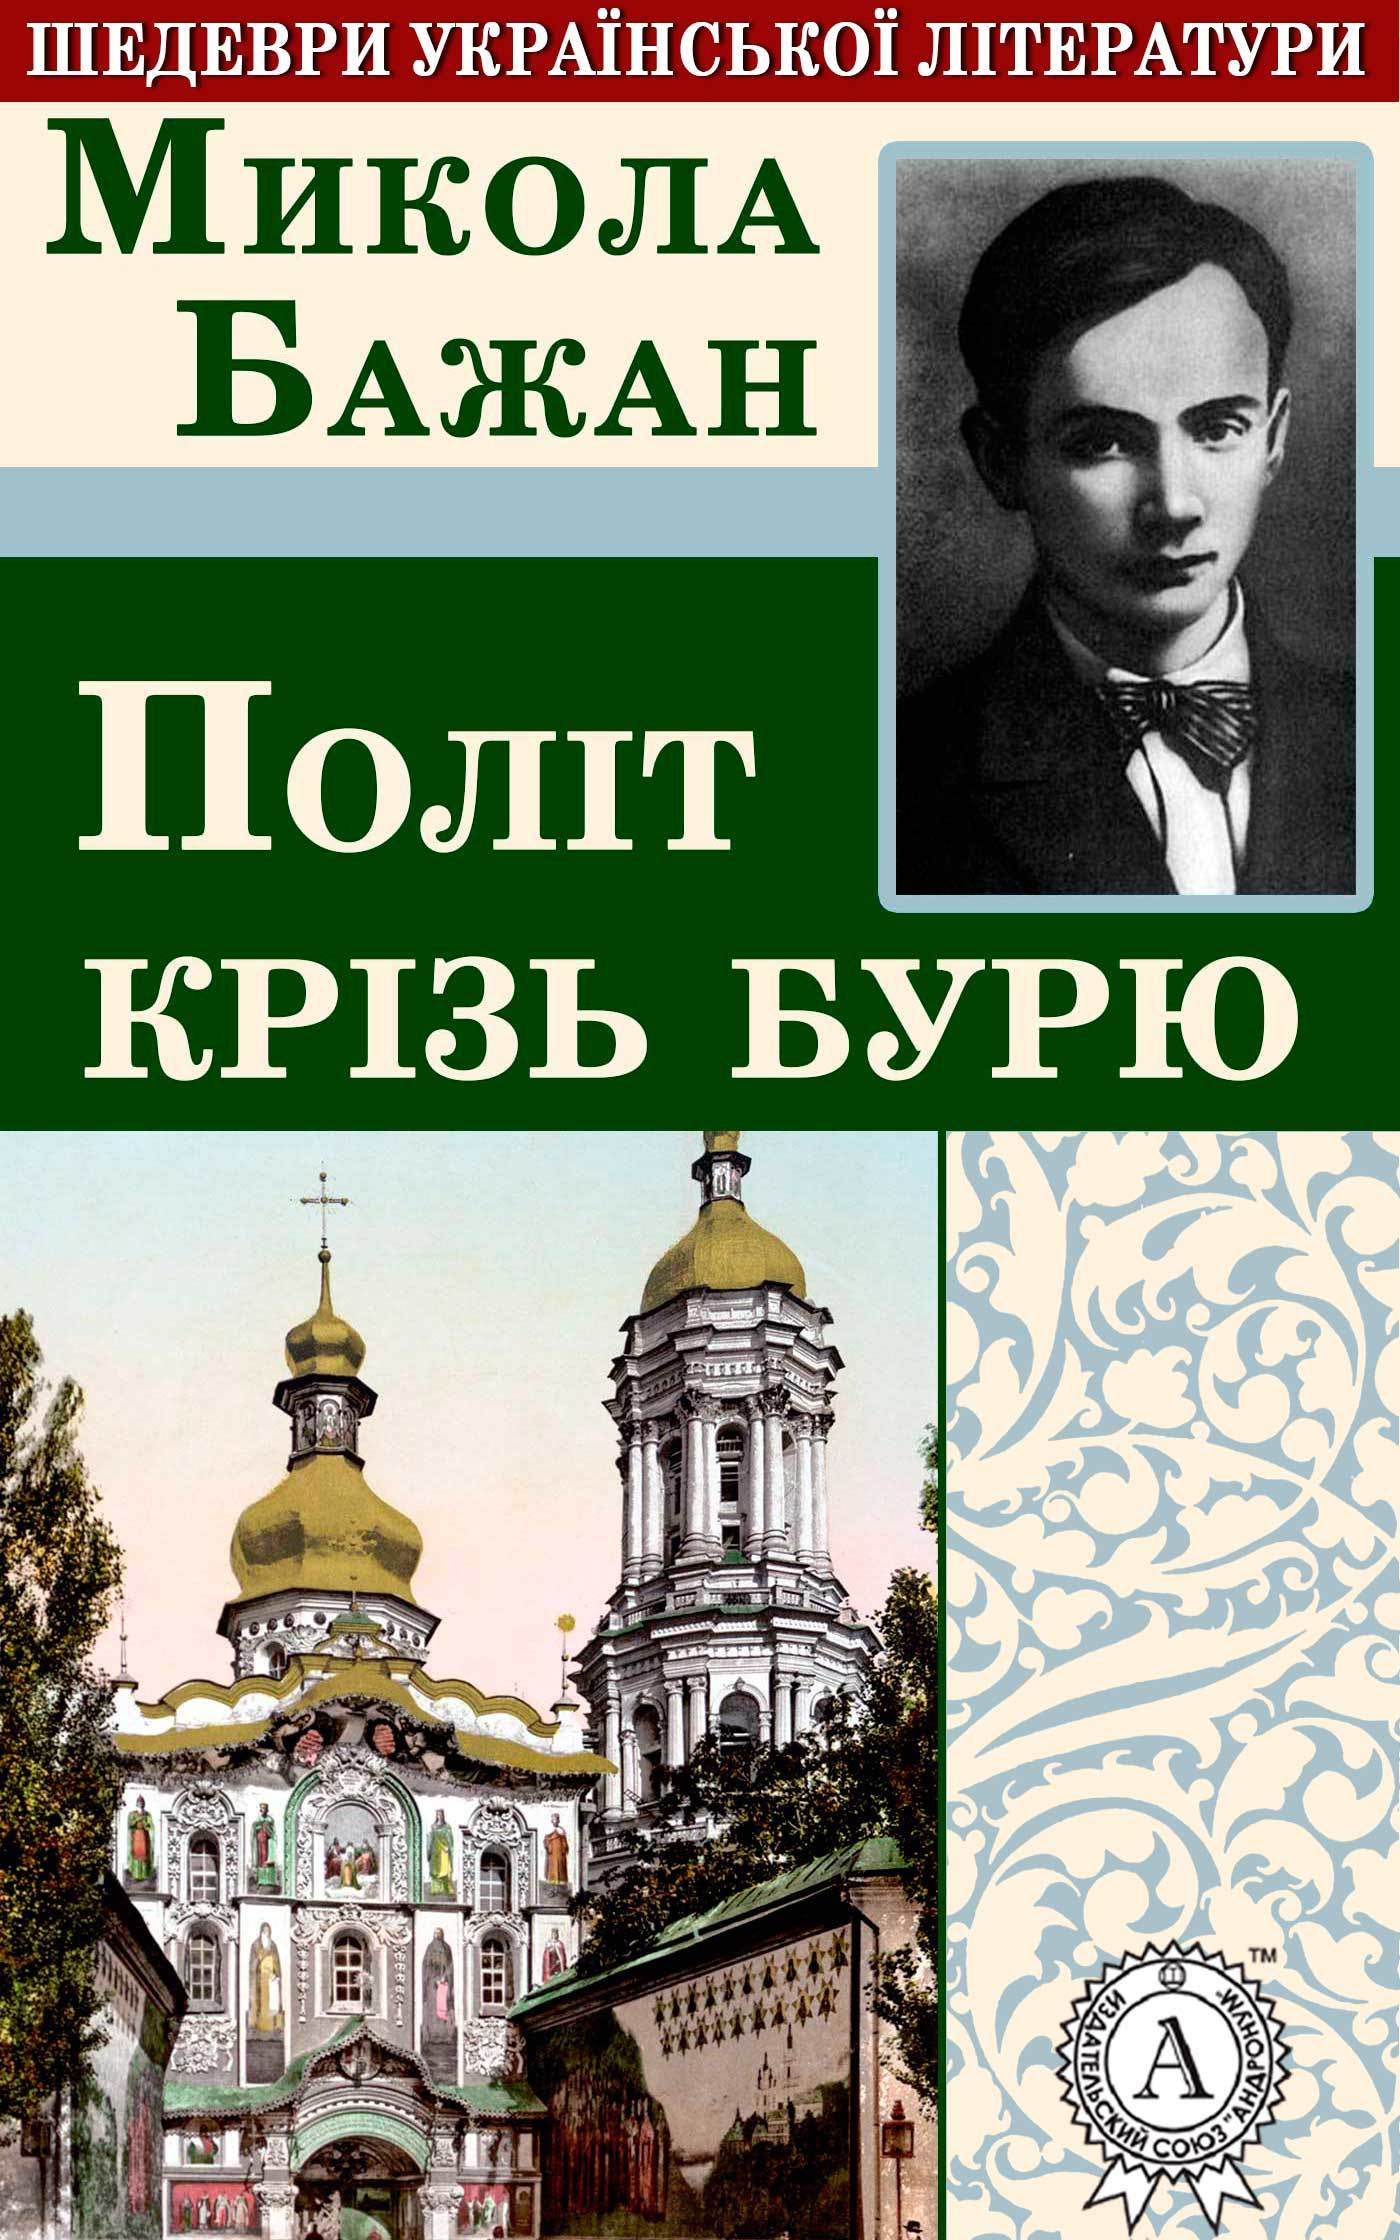 Микола Бажан «Політ крізь бурю»